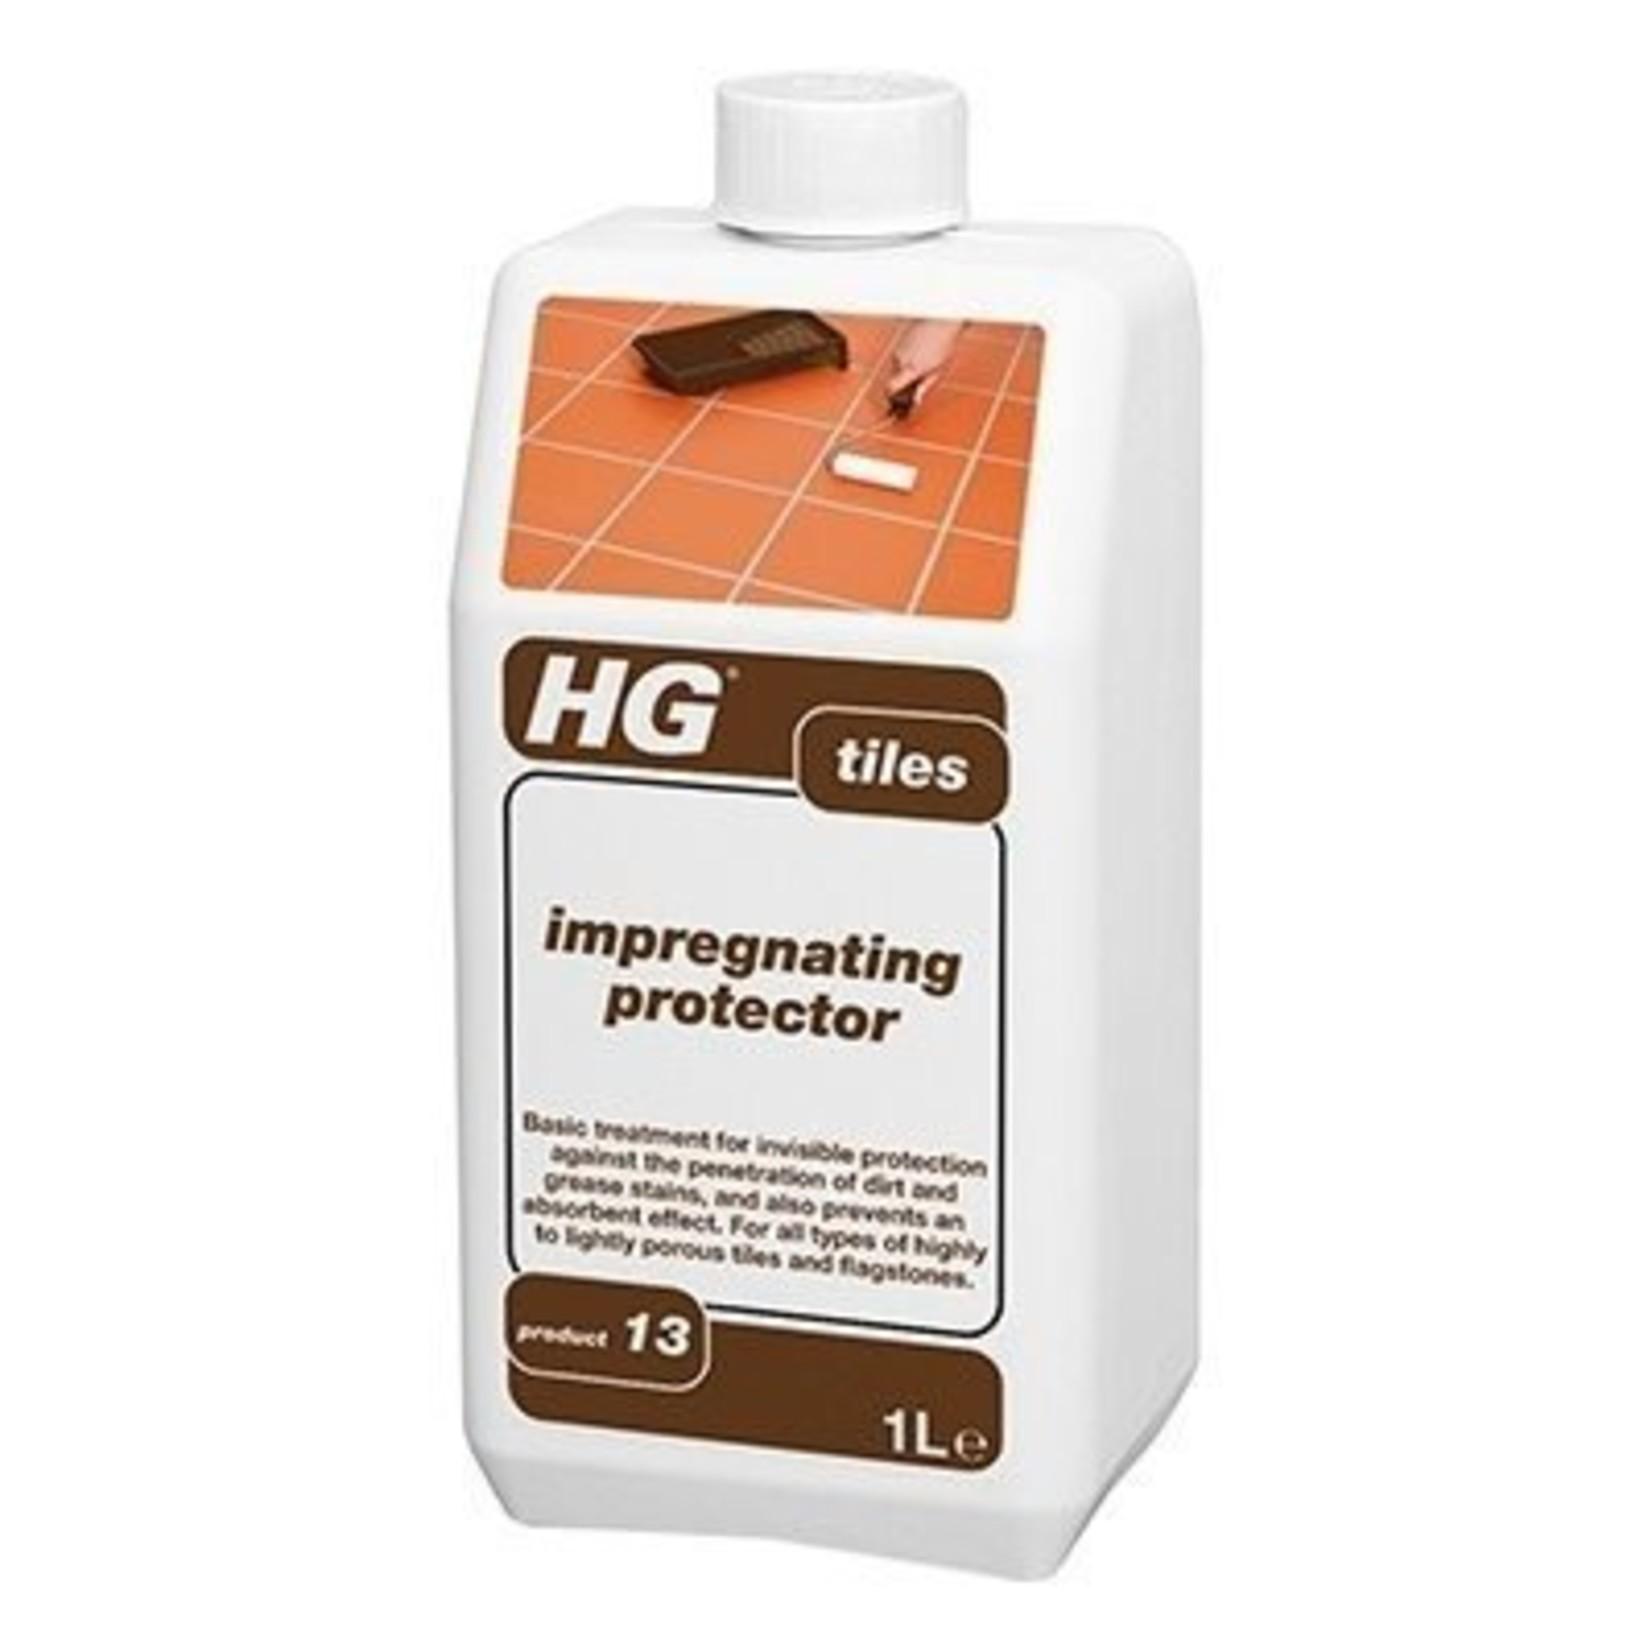 HG HG IMPREGNATING PROTECTOR TILES P.13